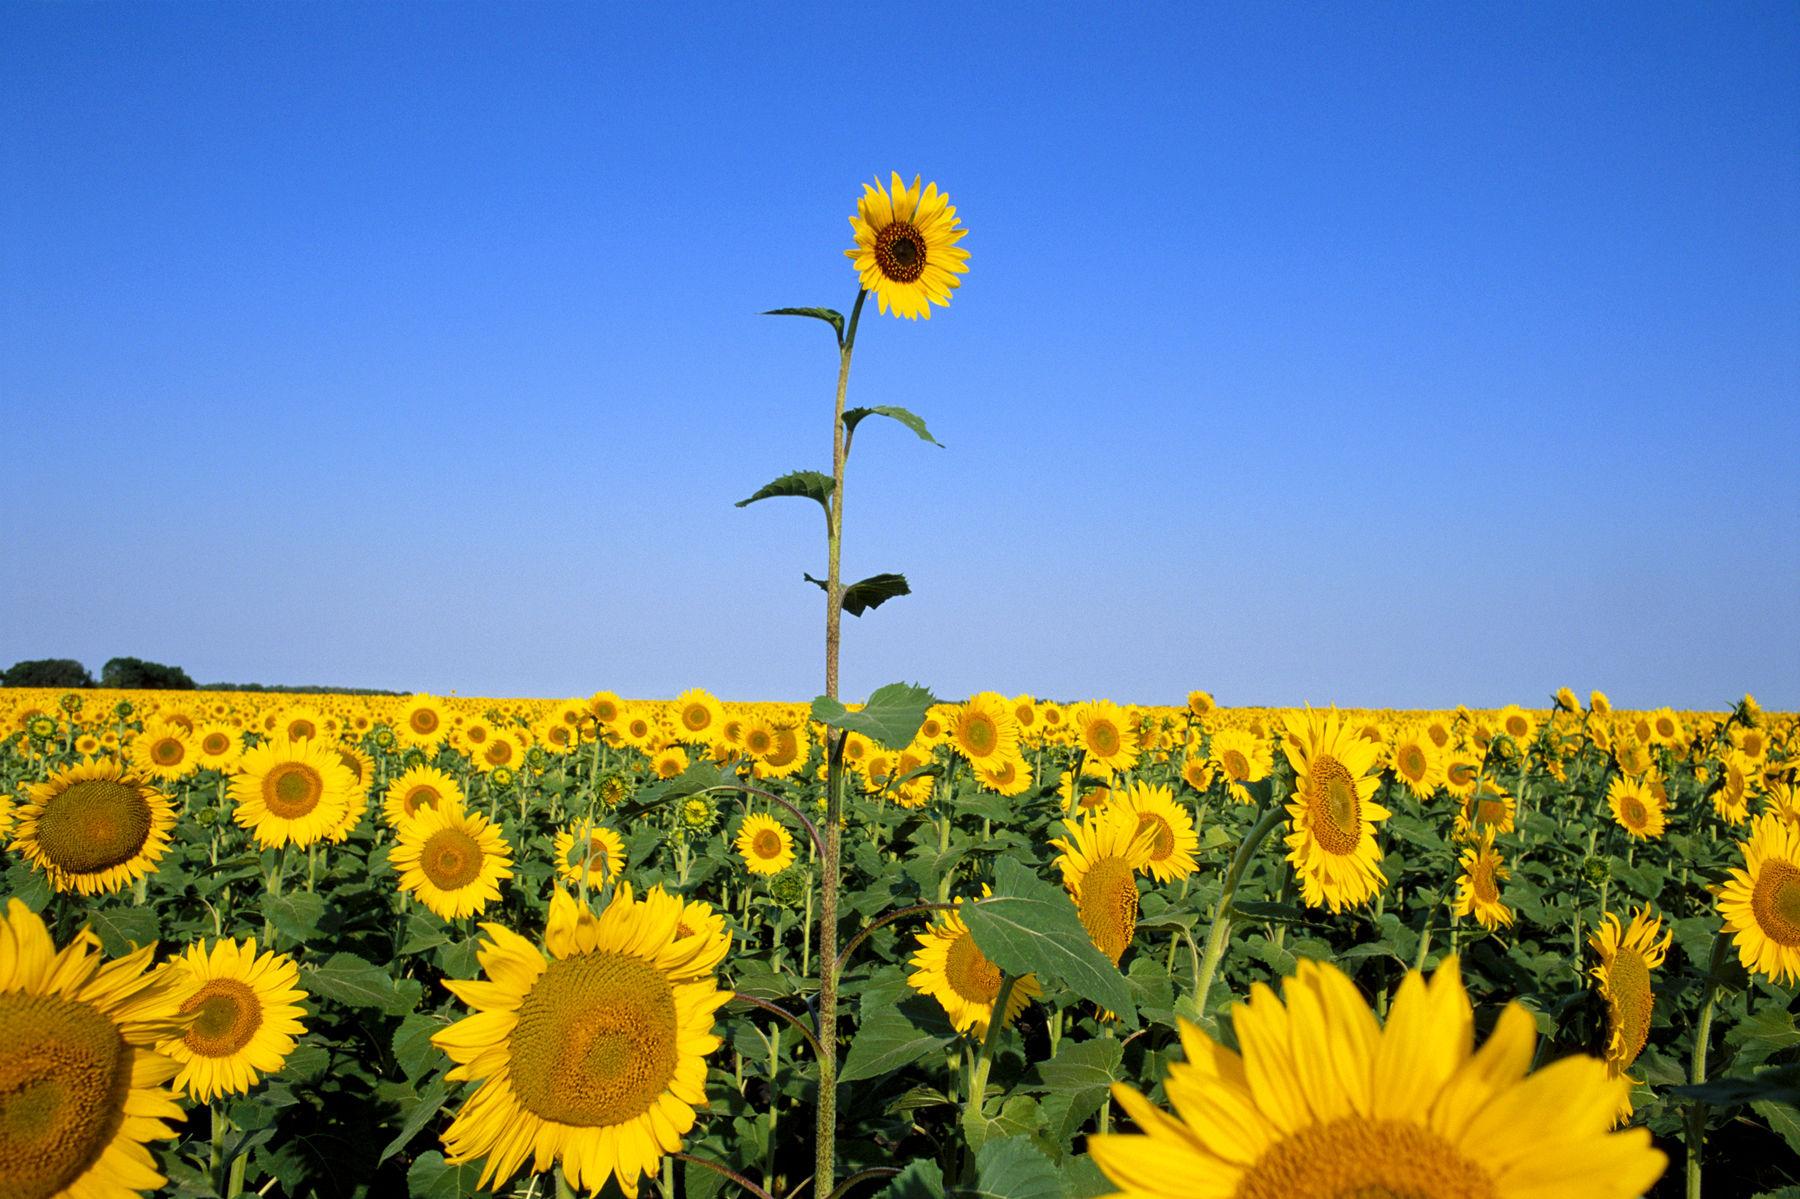 Sunflower (Helianthus annus) rising above field